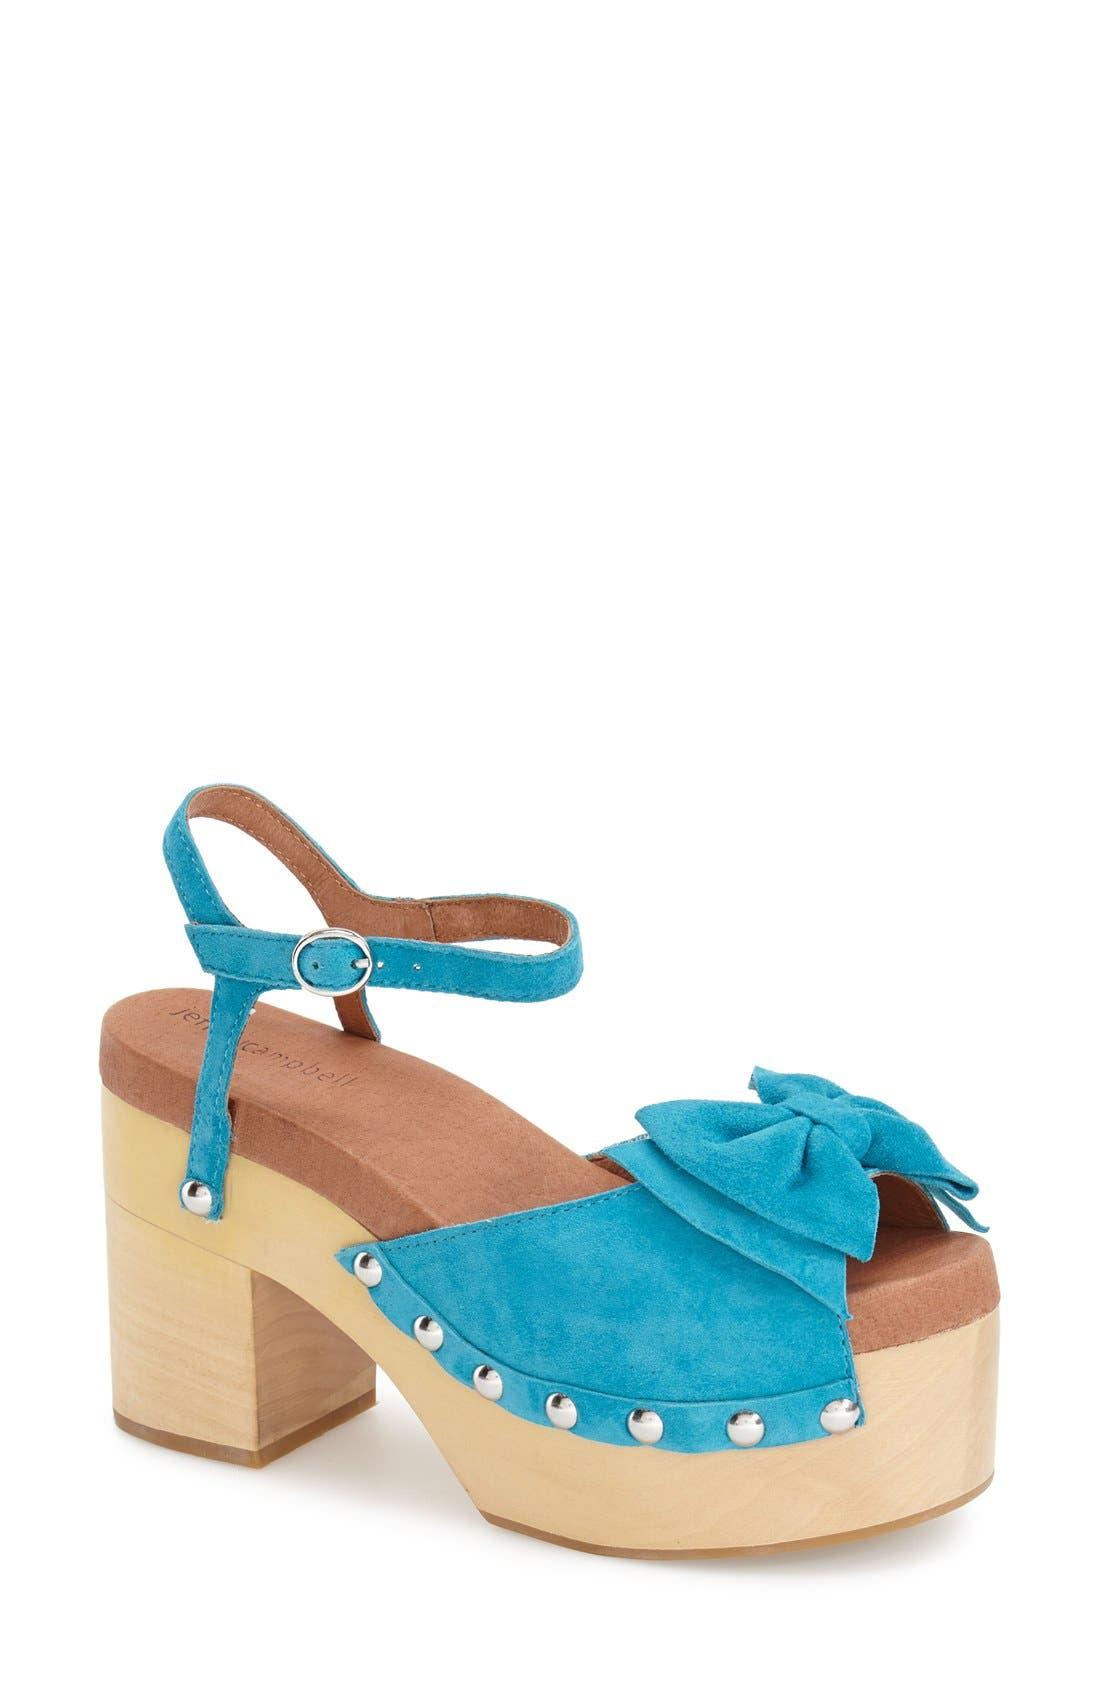 Main Image - Jeffrey Campbell 'Bridget' Platform Sandal (Women)